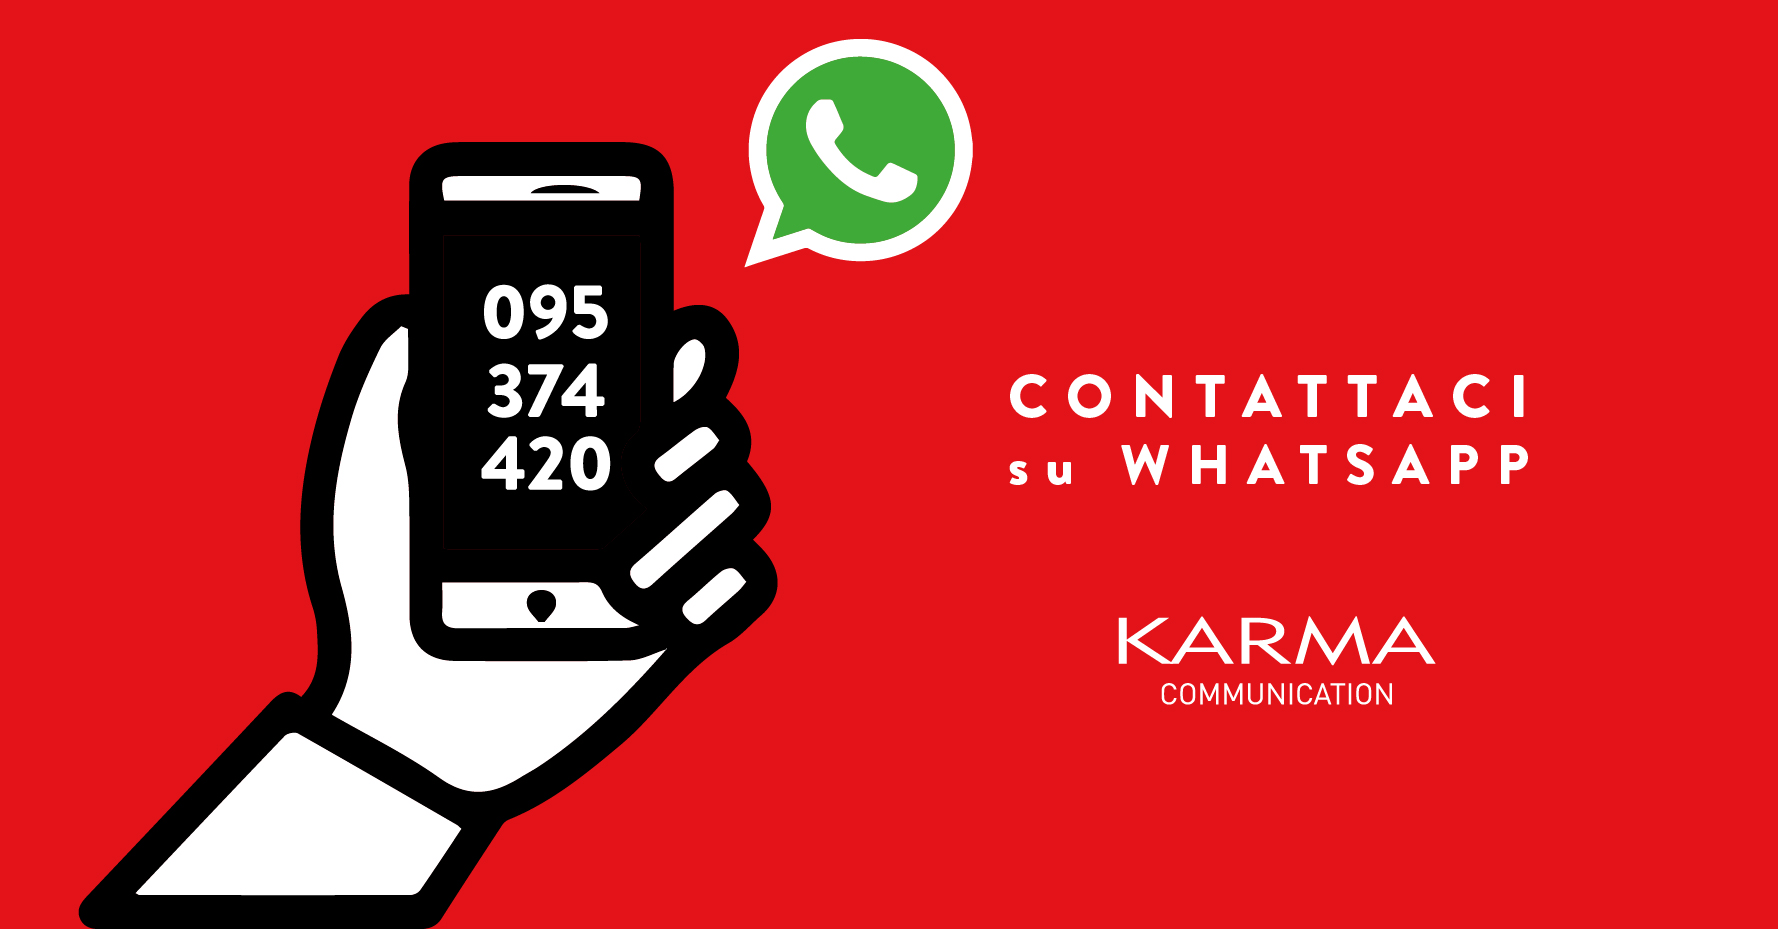 Karma Communication su Whatsapp